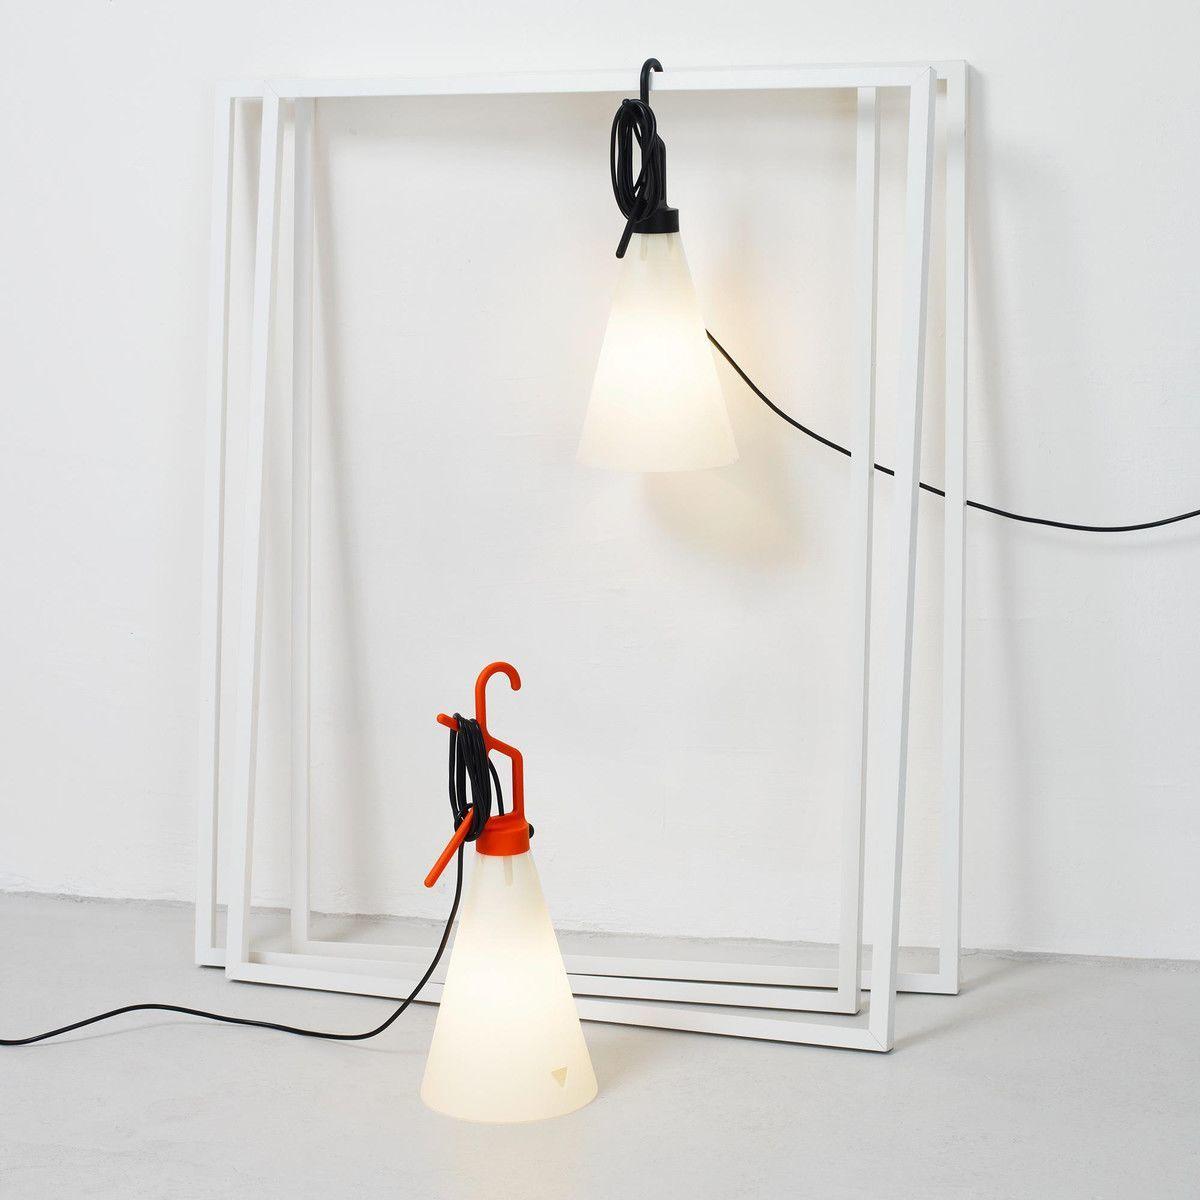 May day lamp flos konstantin grcic - Lamp may day ...